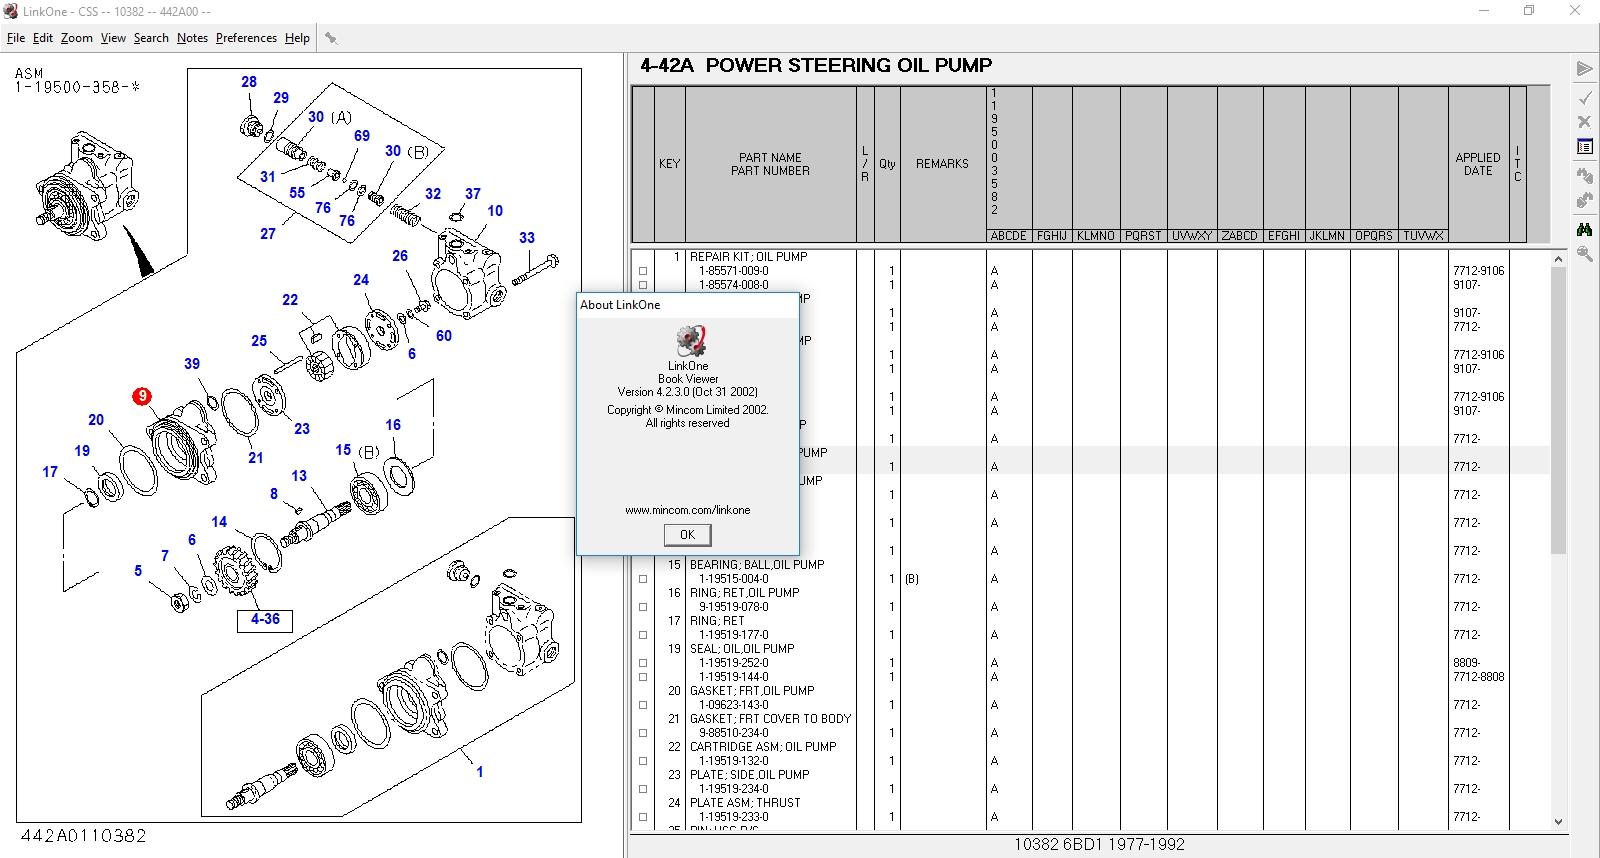 ISUZU_CSS-NET_EPC_052020_Electronic_Parts_Catalog_4